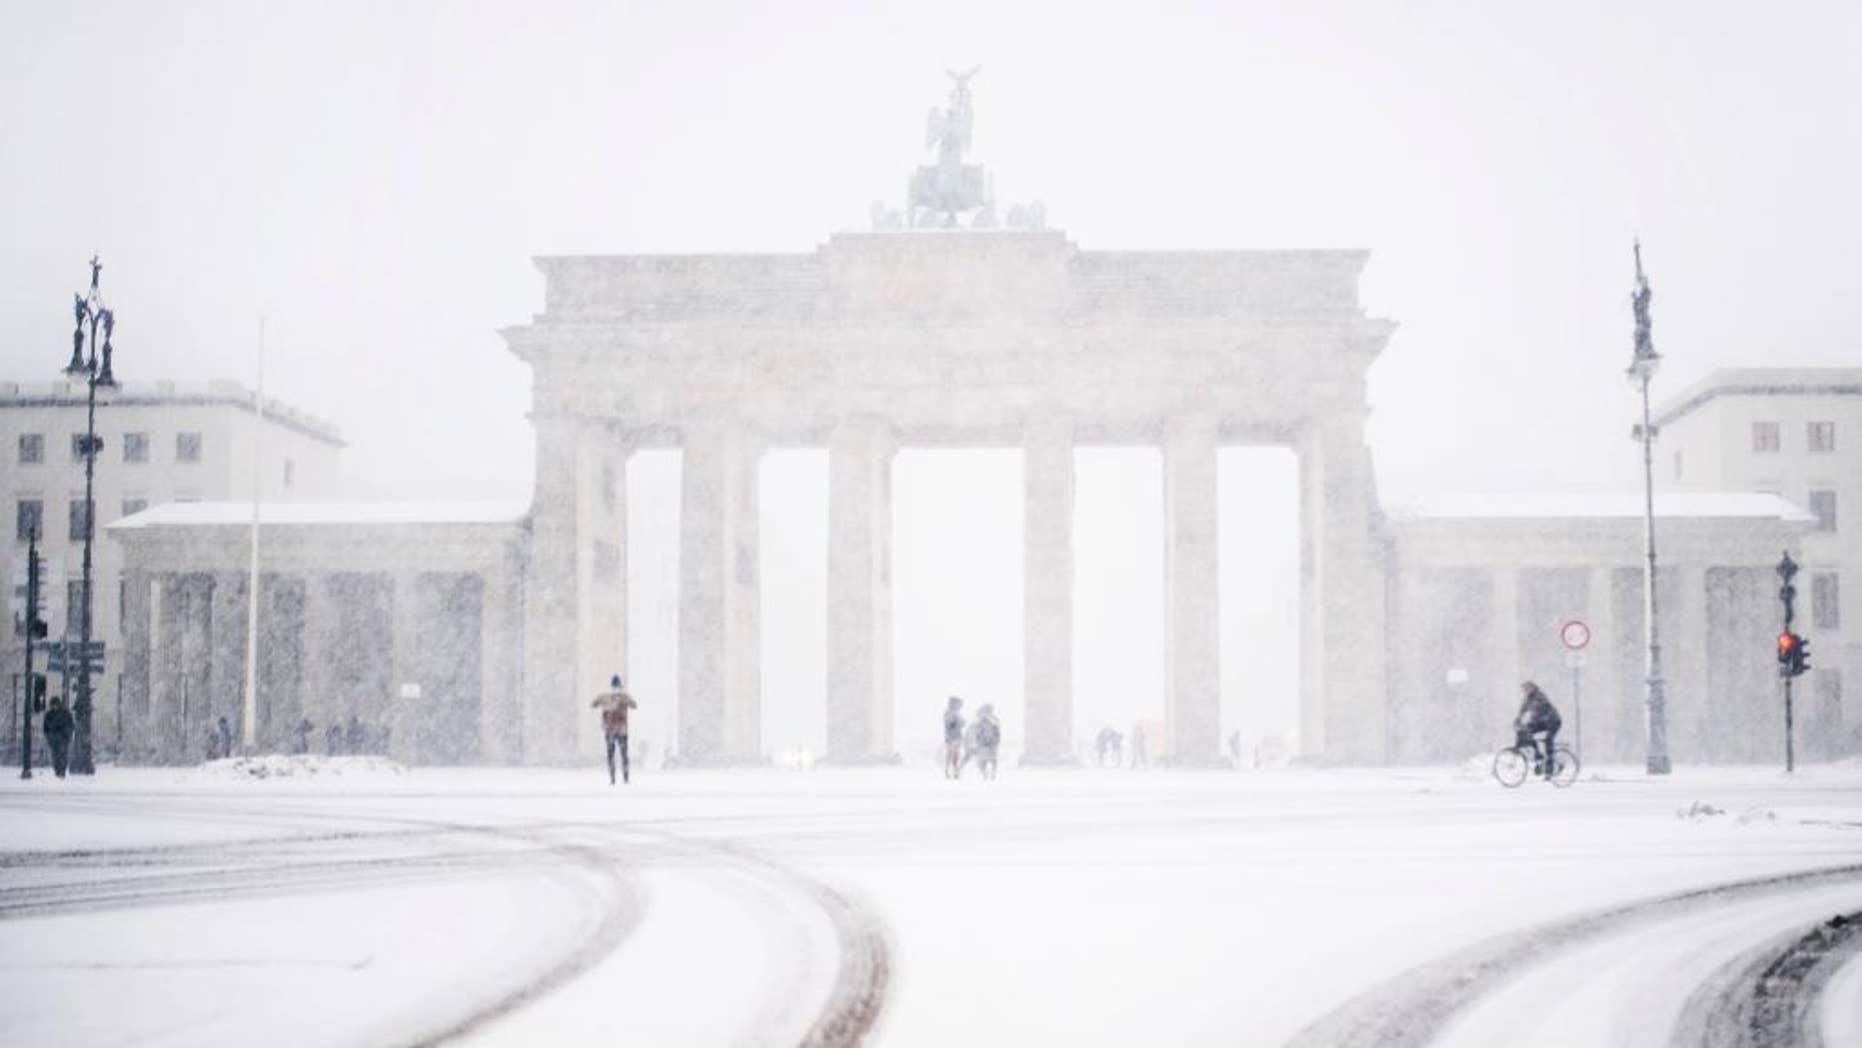 The Brandenburg gate can be seen through the window of a car during  snowfall  in Berlin, Germany, Wednesday, Jan. 11, 2017.  (Sophia Kembowski/dpa via AP)